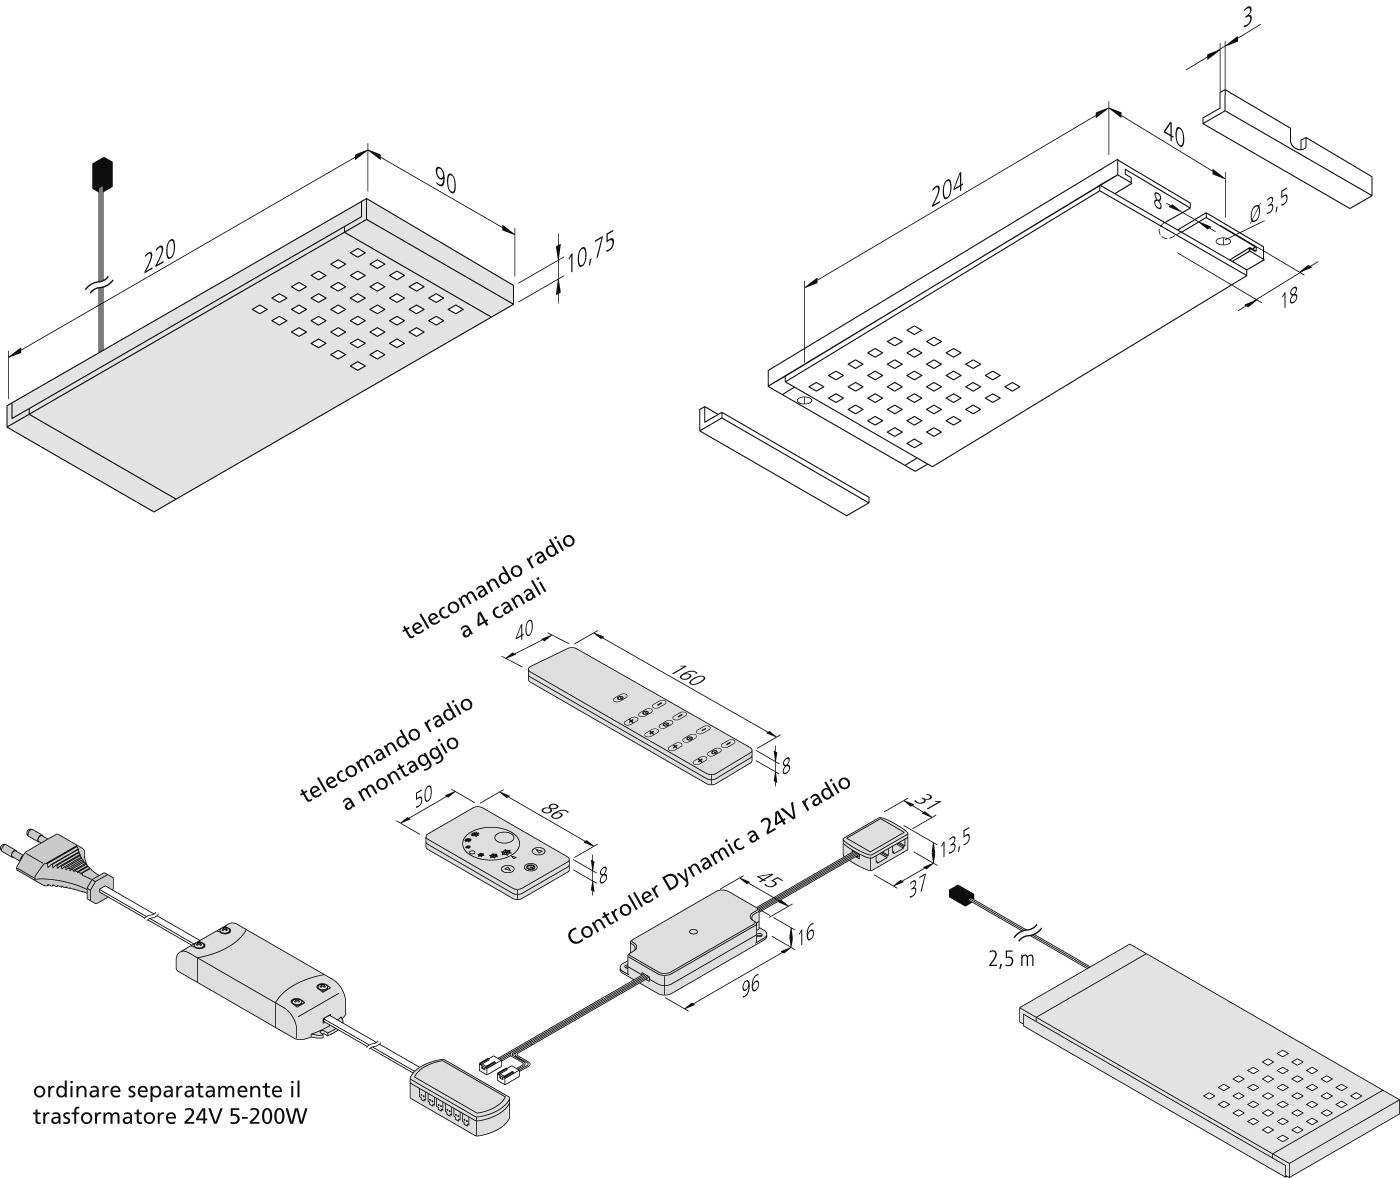 Anteprima: Dynamic-LED-L-PAD_vec_-it